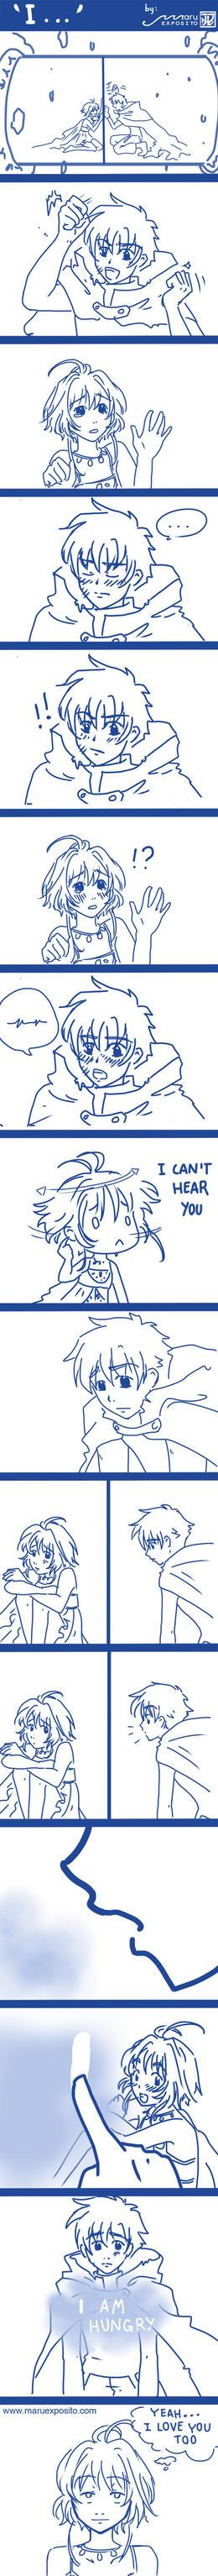 I... -TRC Comic by MaruExposito